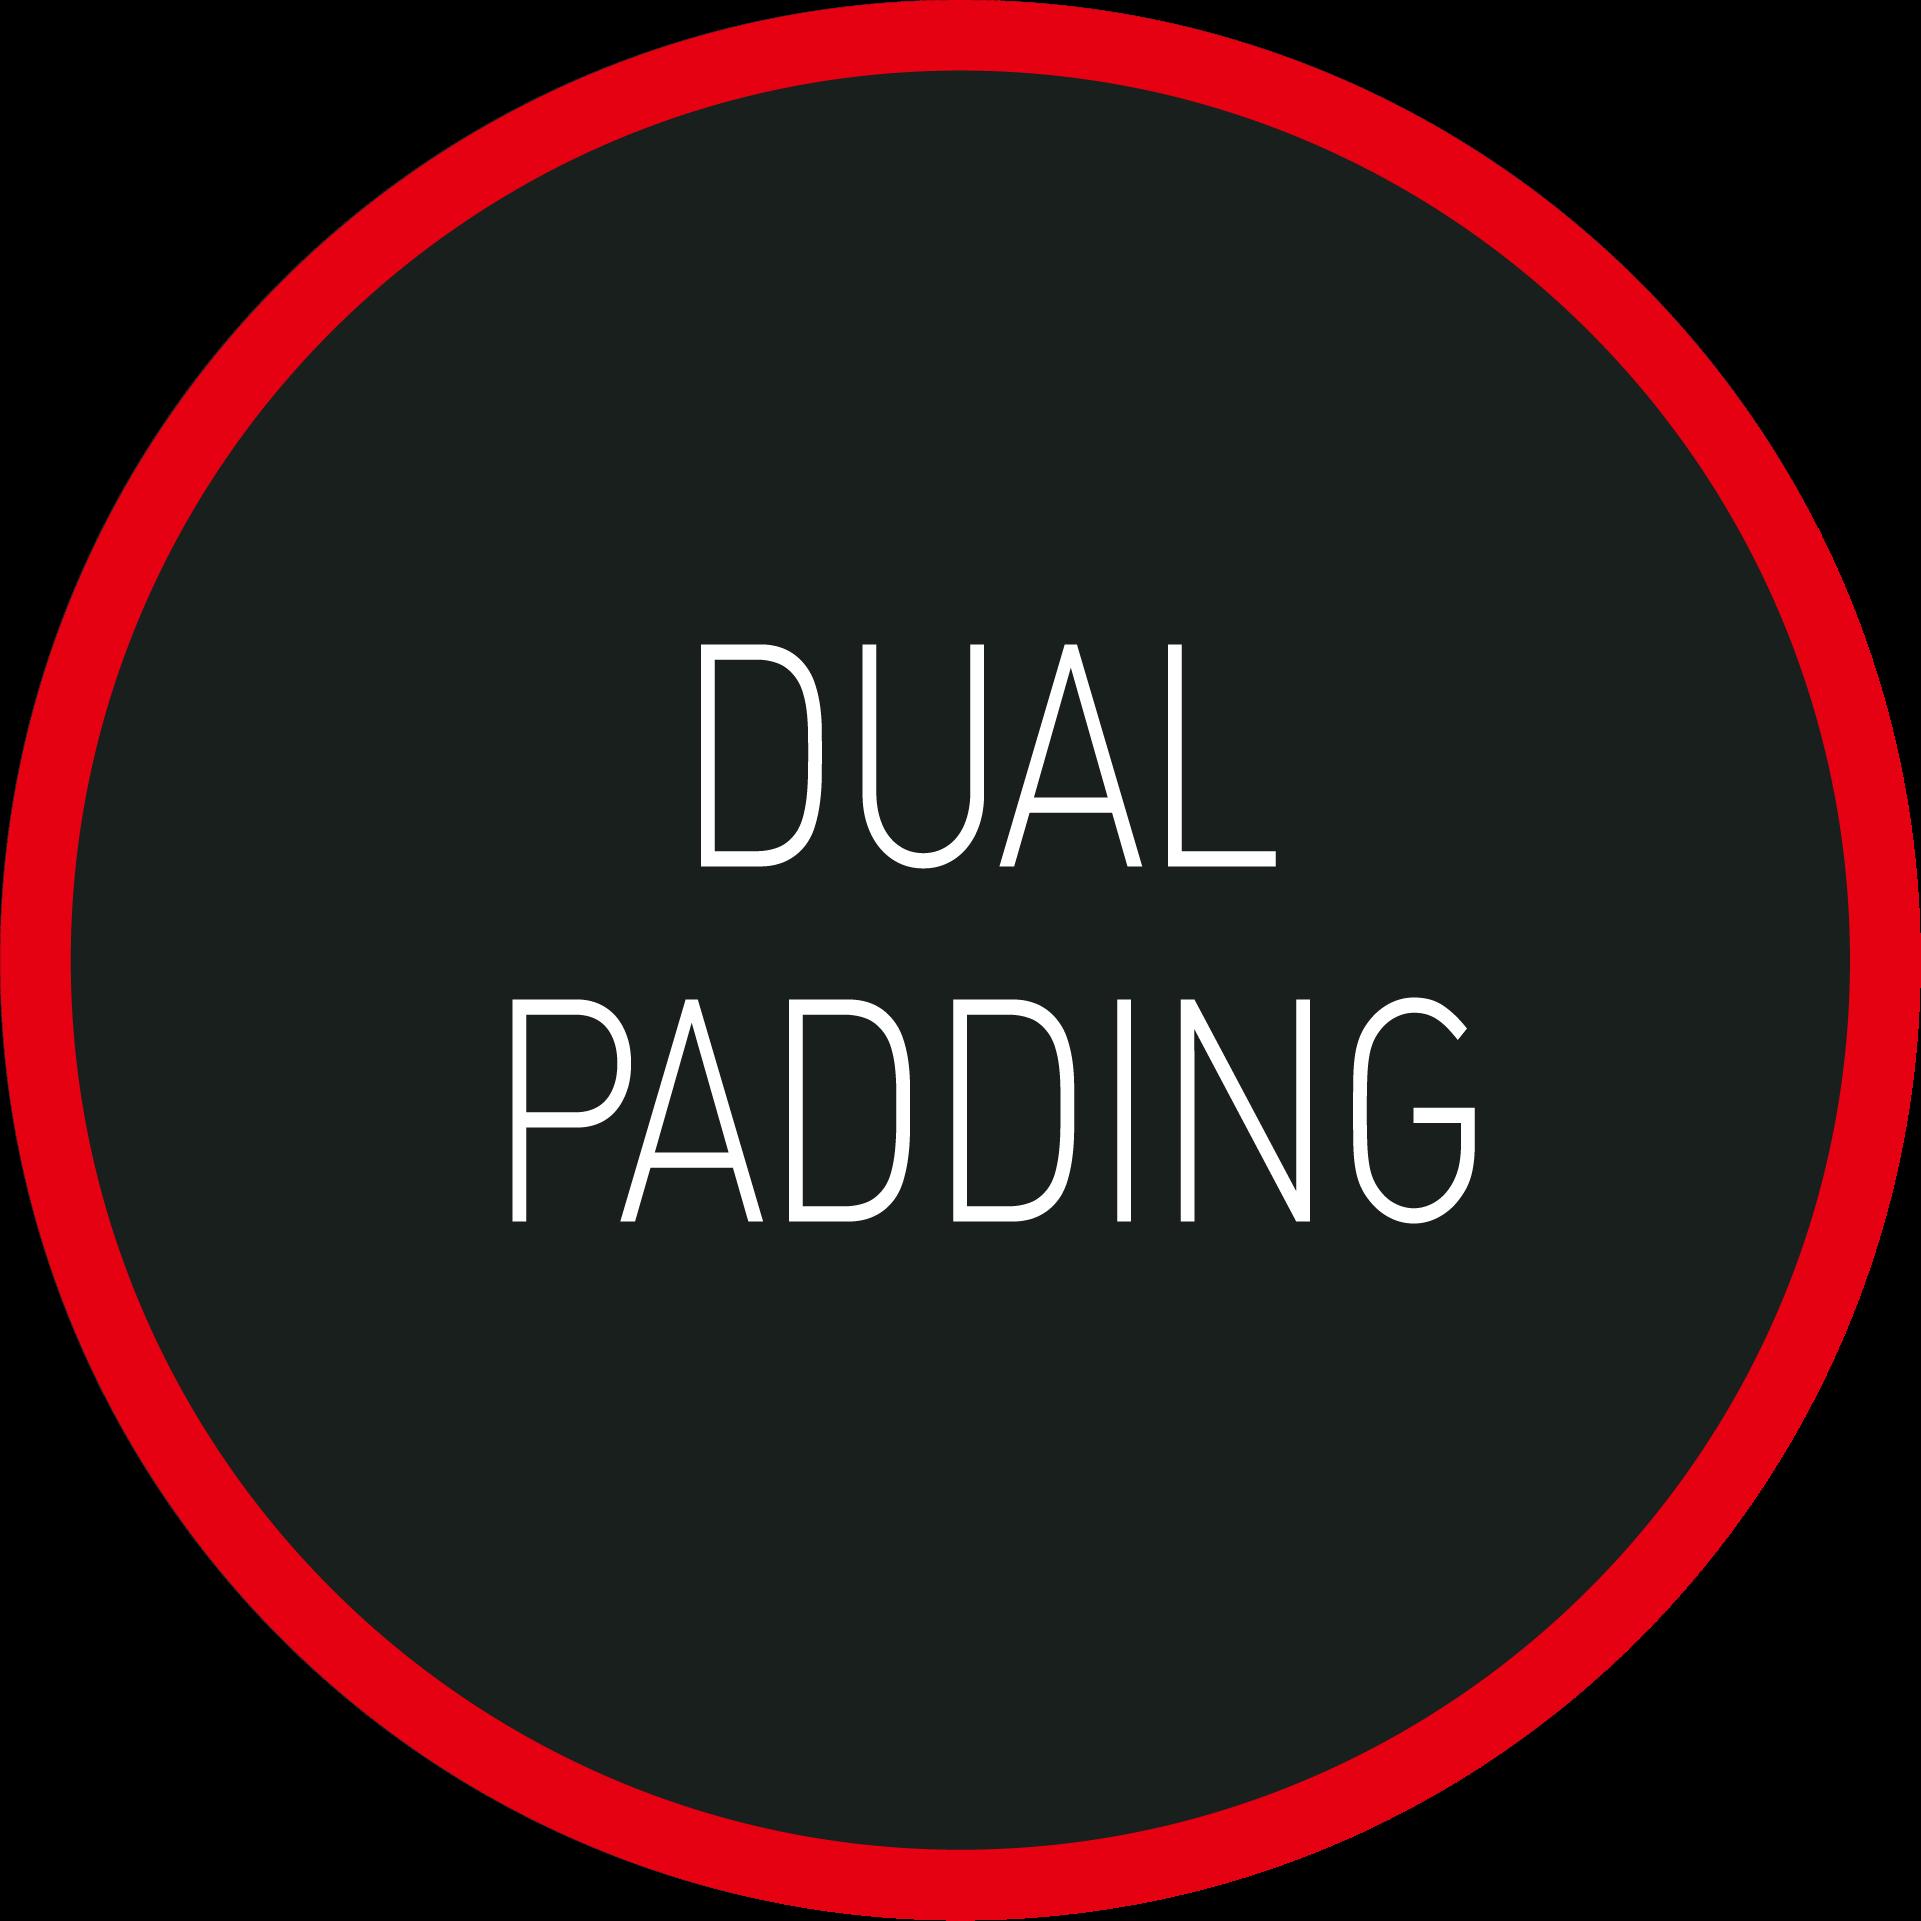 Selle-Italia-icon-02-dual-padding